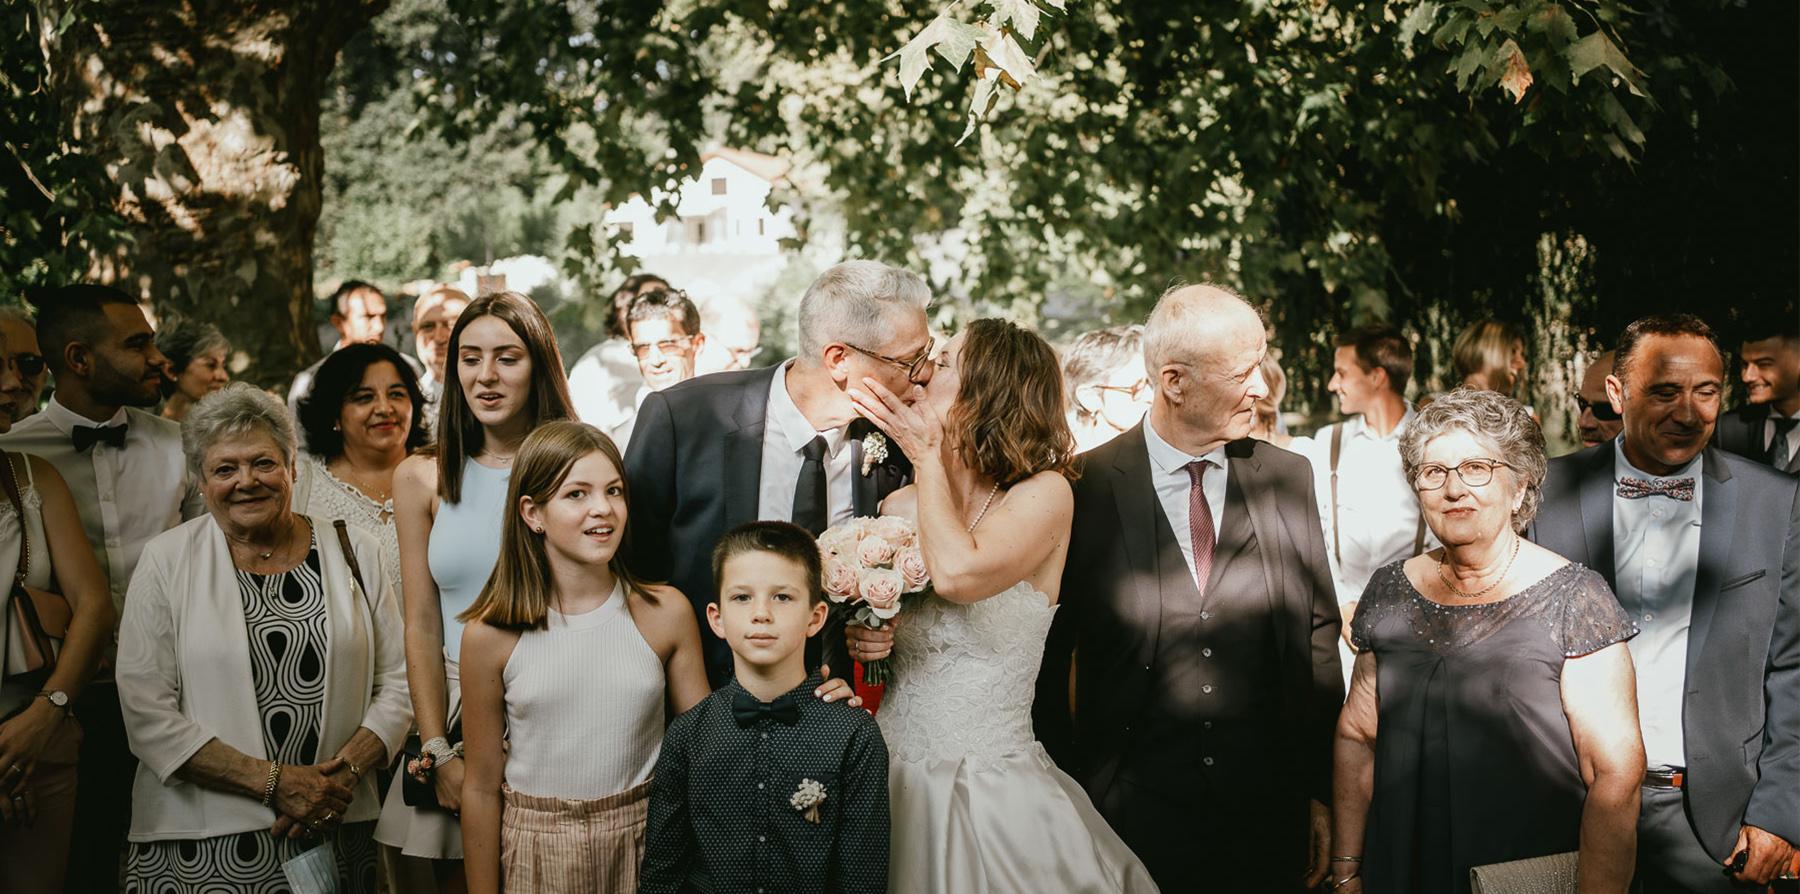 Photographe mariage landes dax aquitaine 19